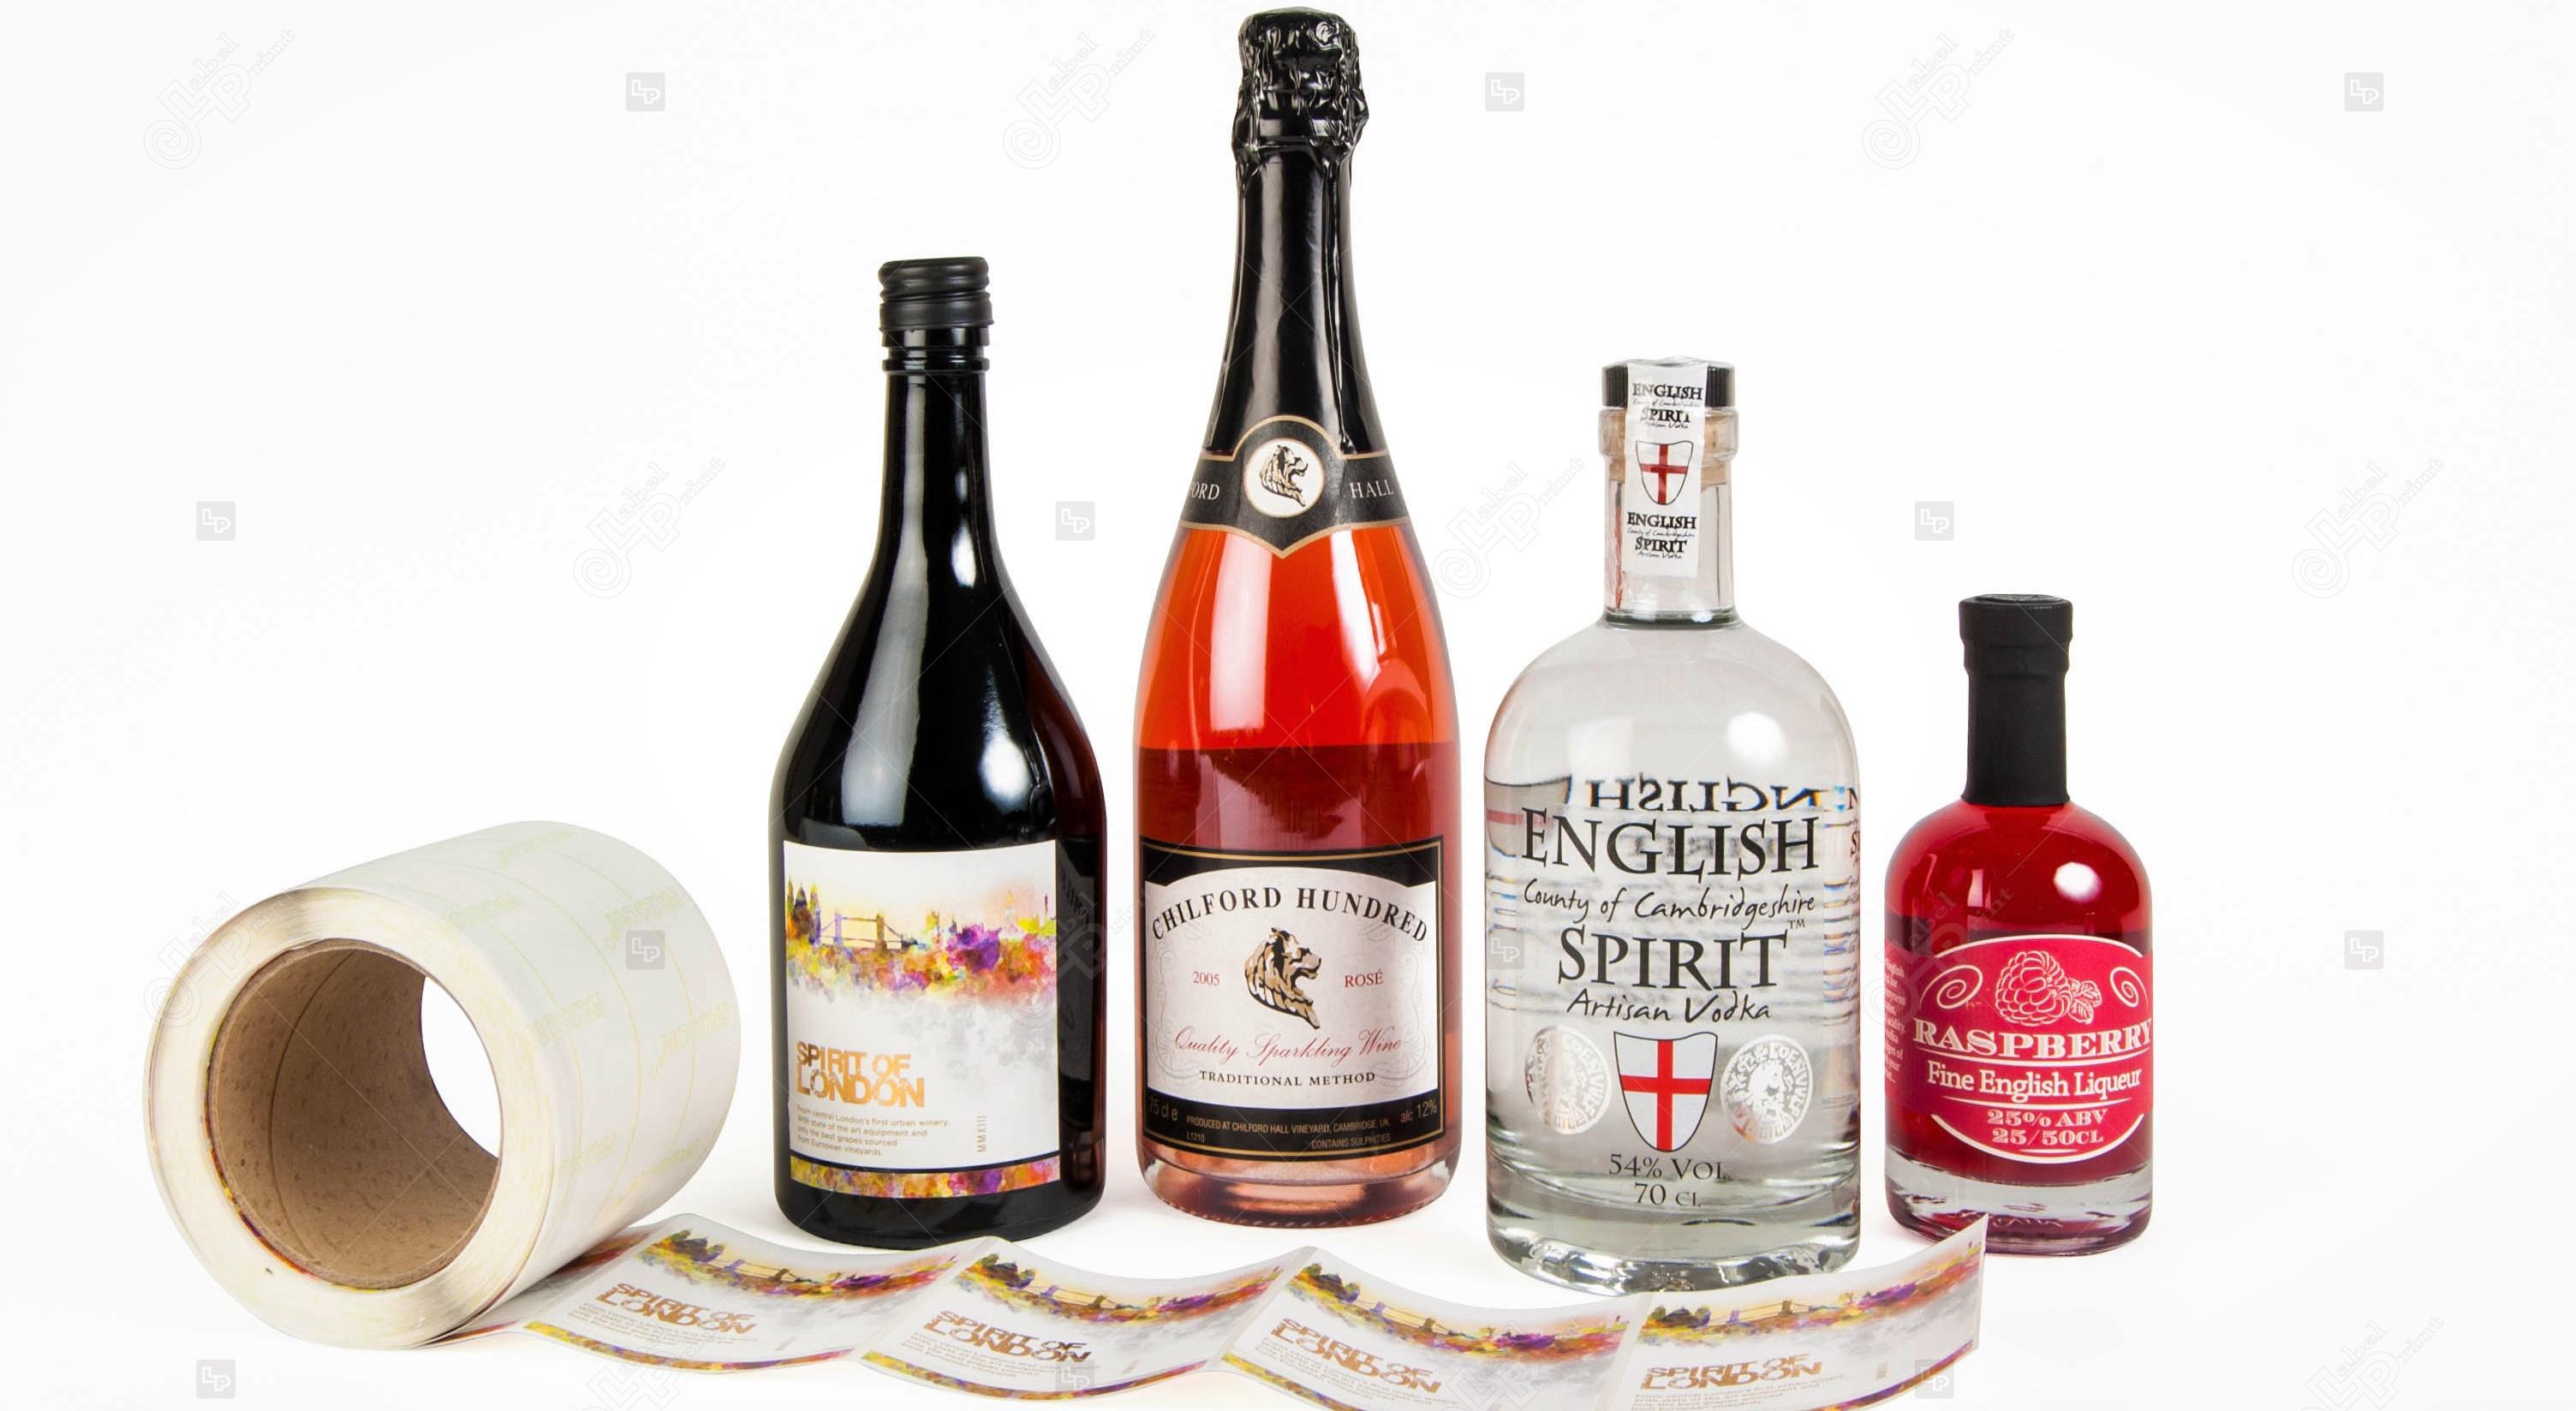 Cum sa faci etichete autocolante personalizate pentru sticle?